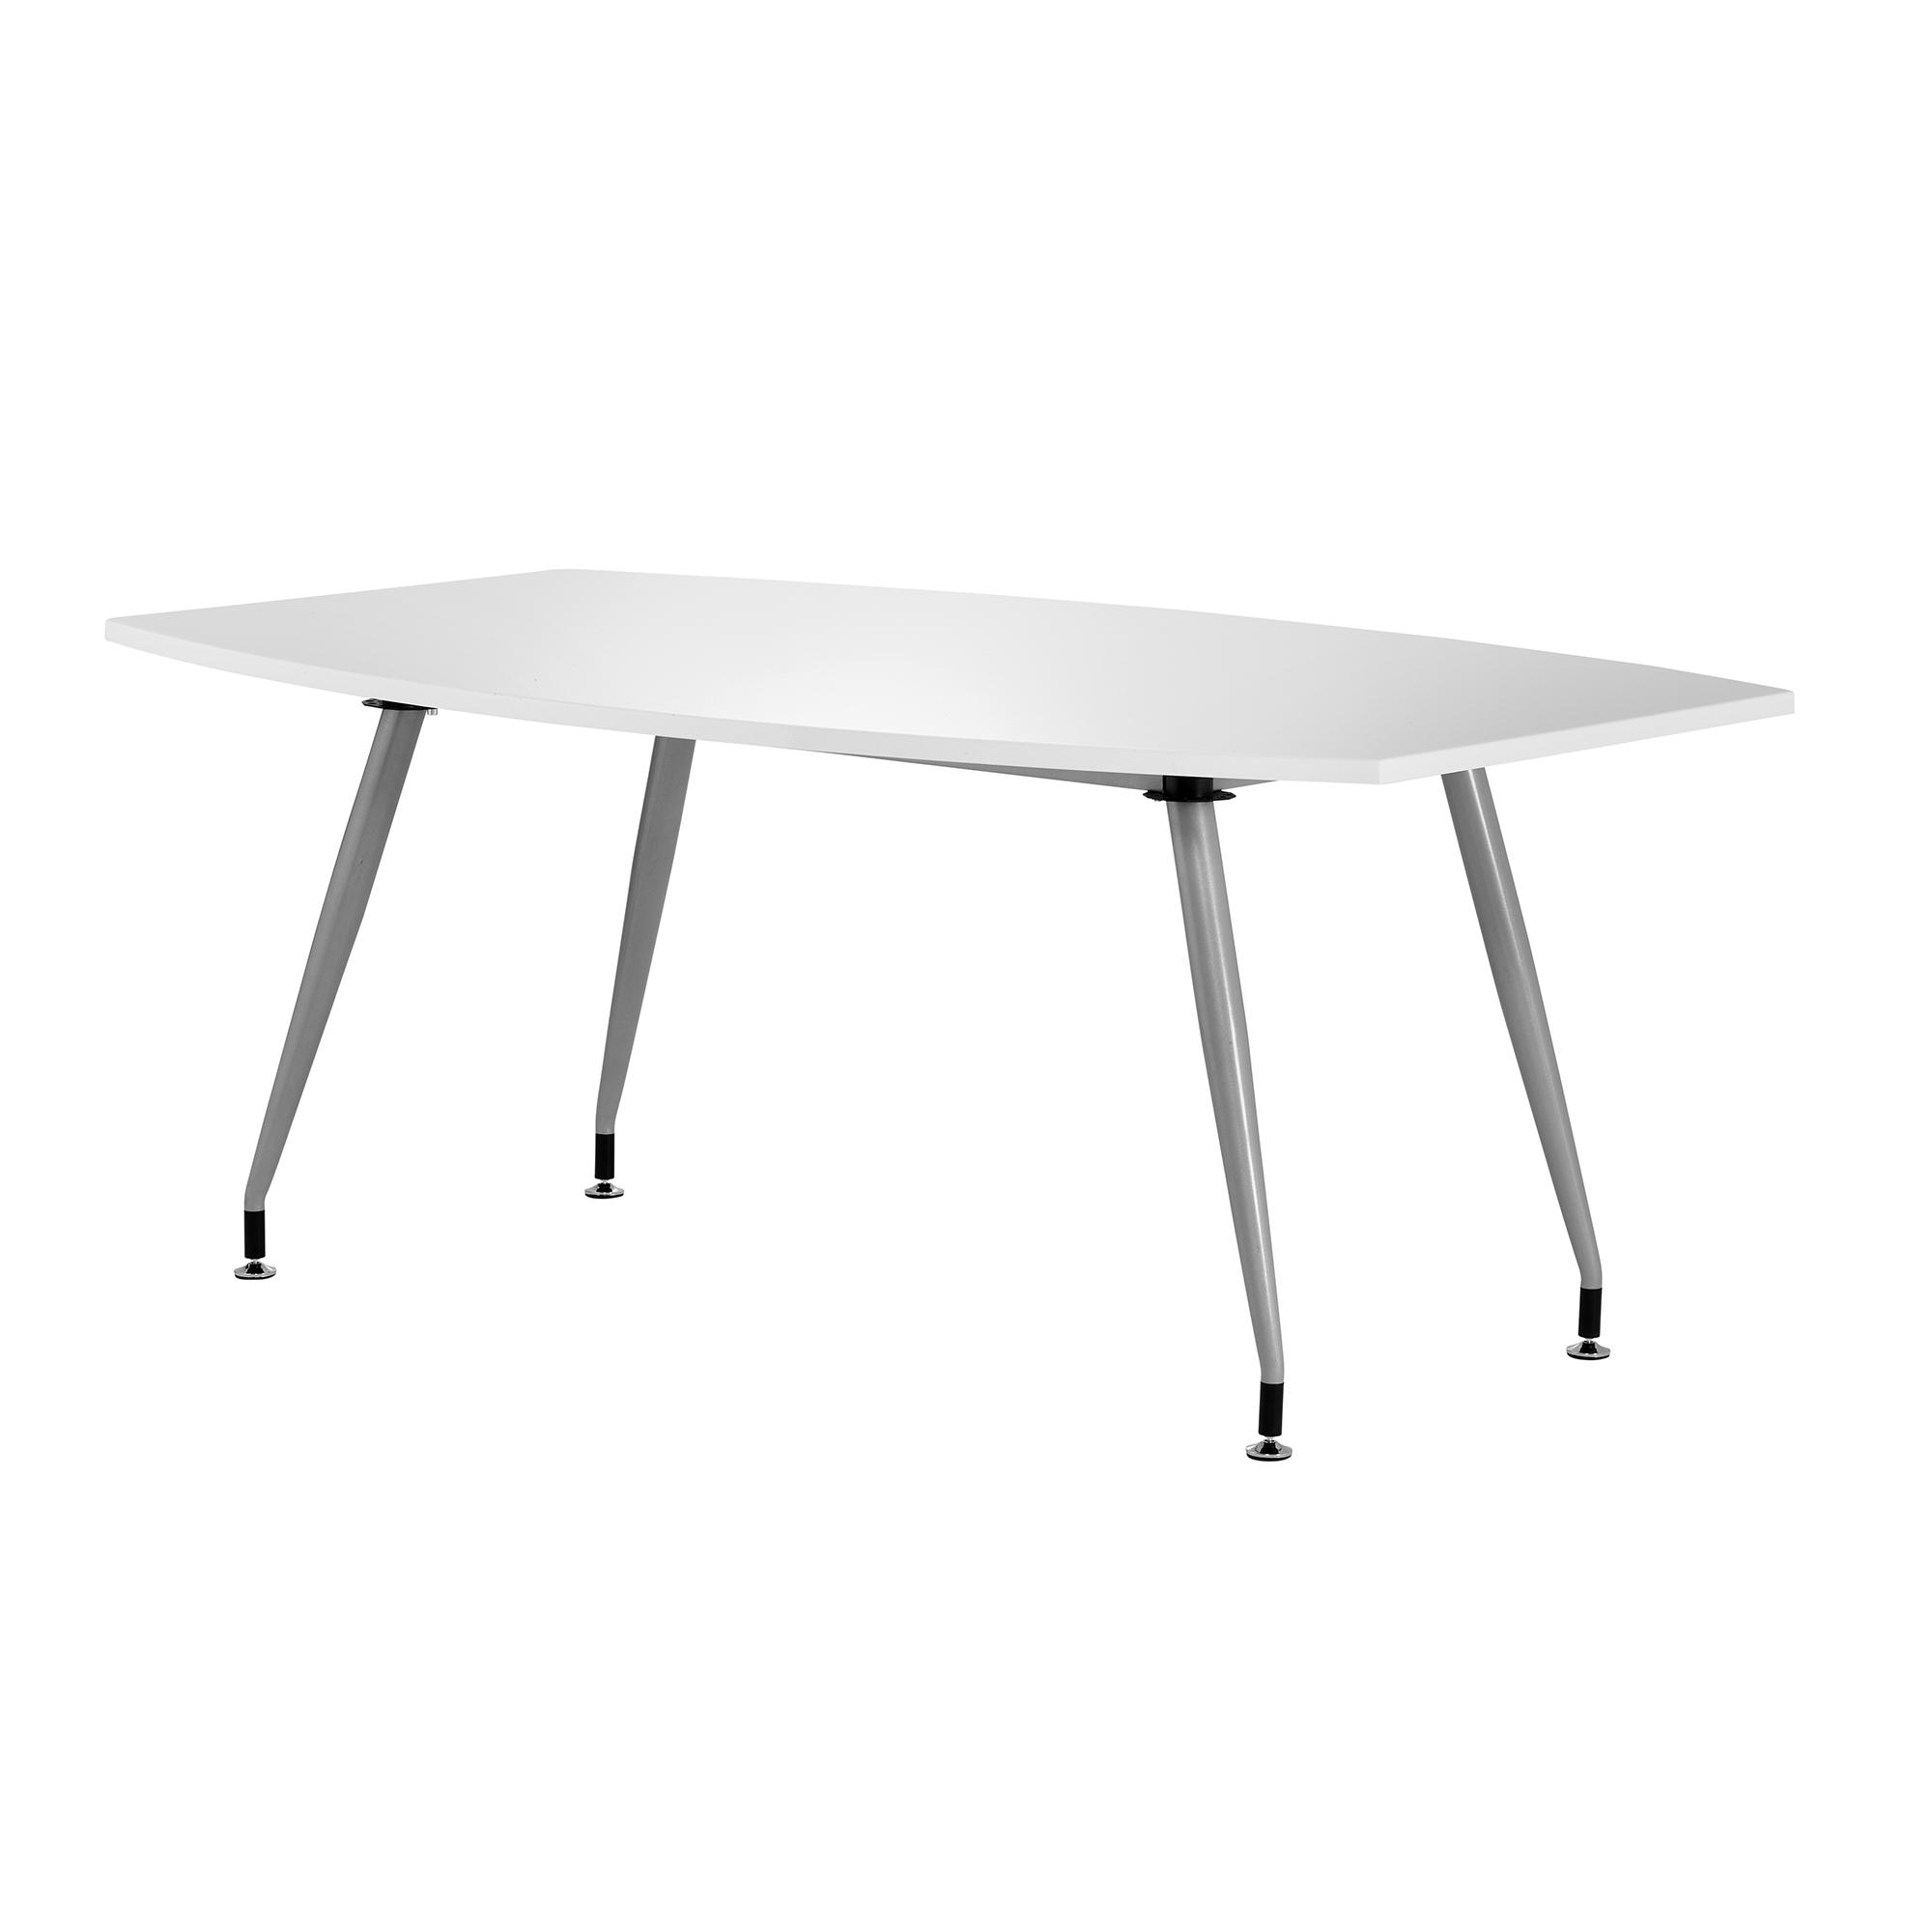 Sonix Boardroom Table Writable Gloss 1800x1200x800mm White Ref I003057